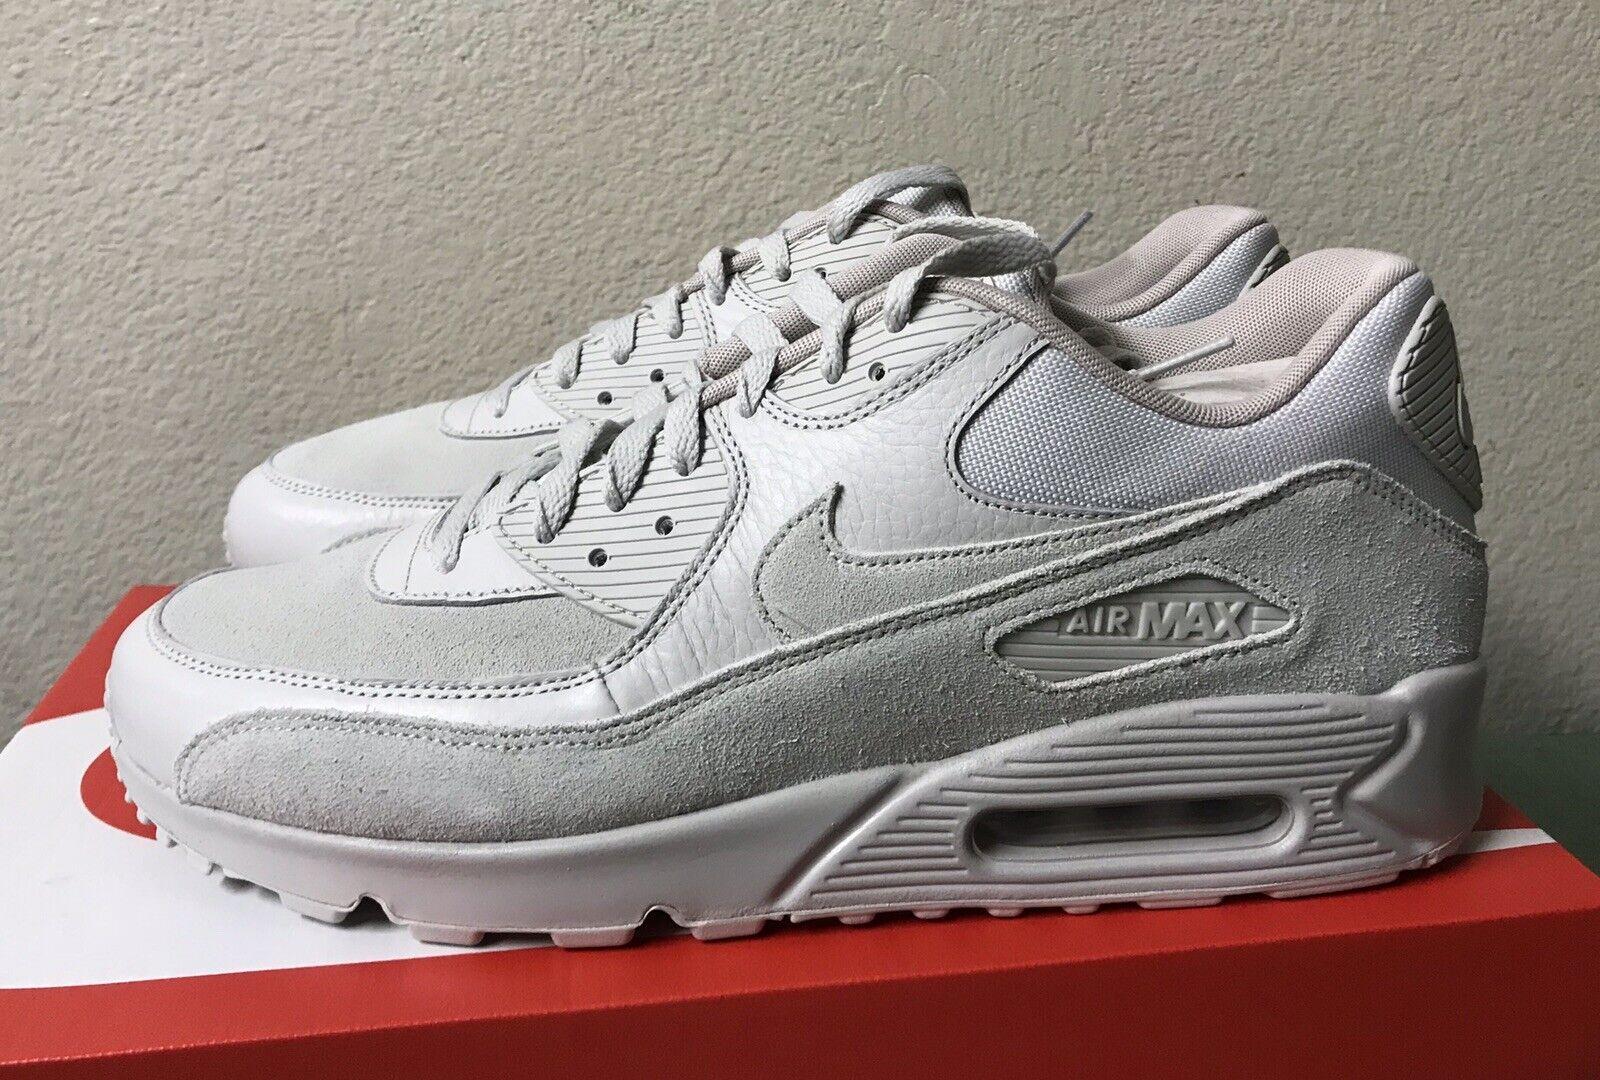 Nike Air Max 90 Premium Mens Sz 12 Light Bone String Running shoes 1 95 97 NEW